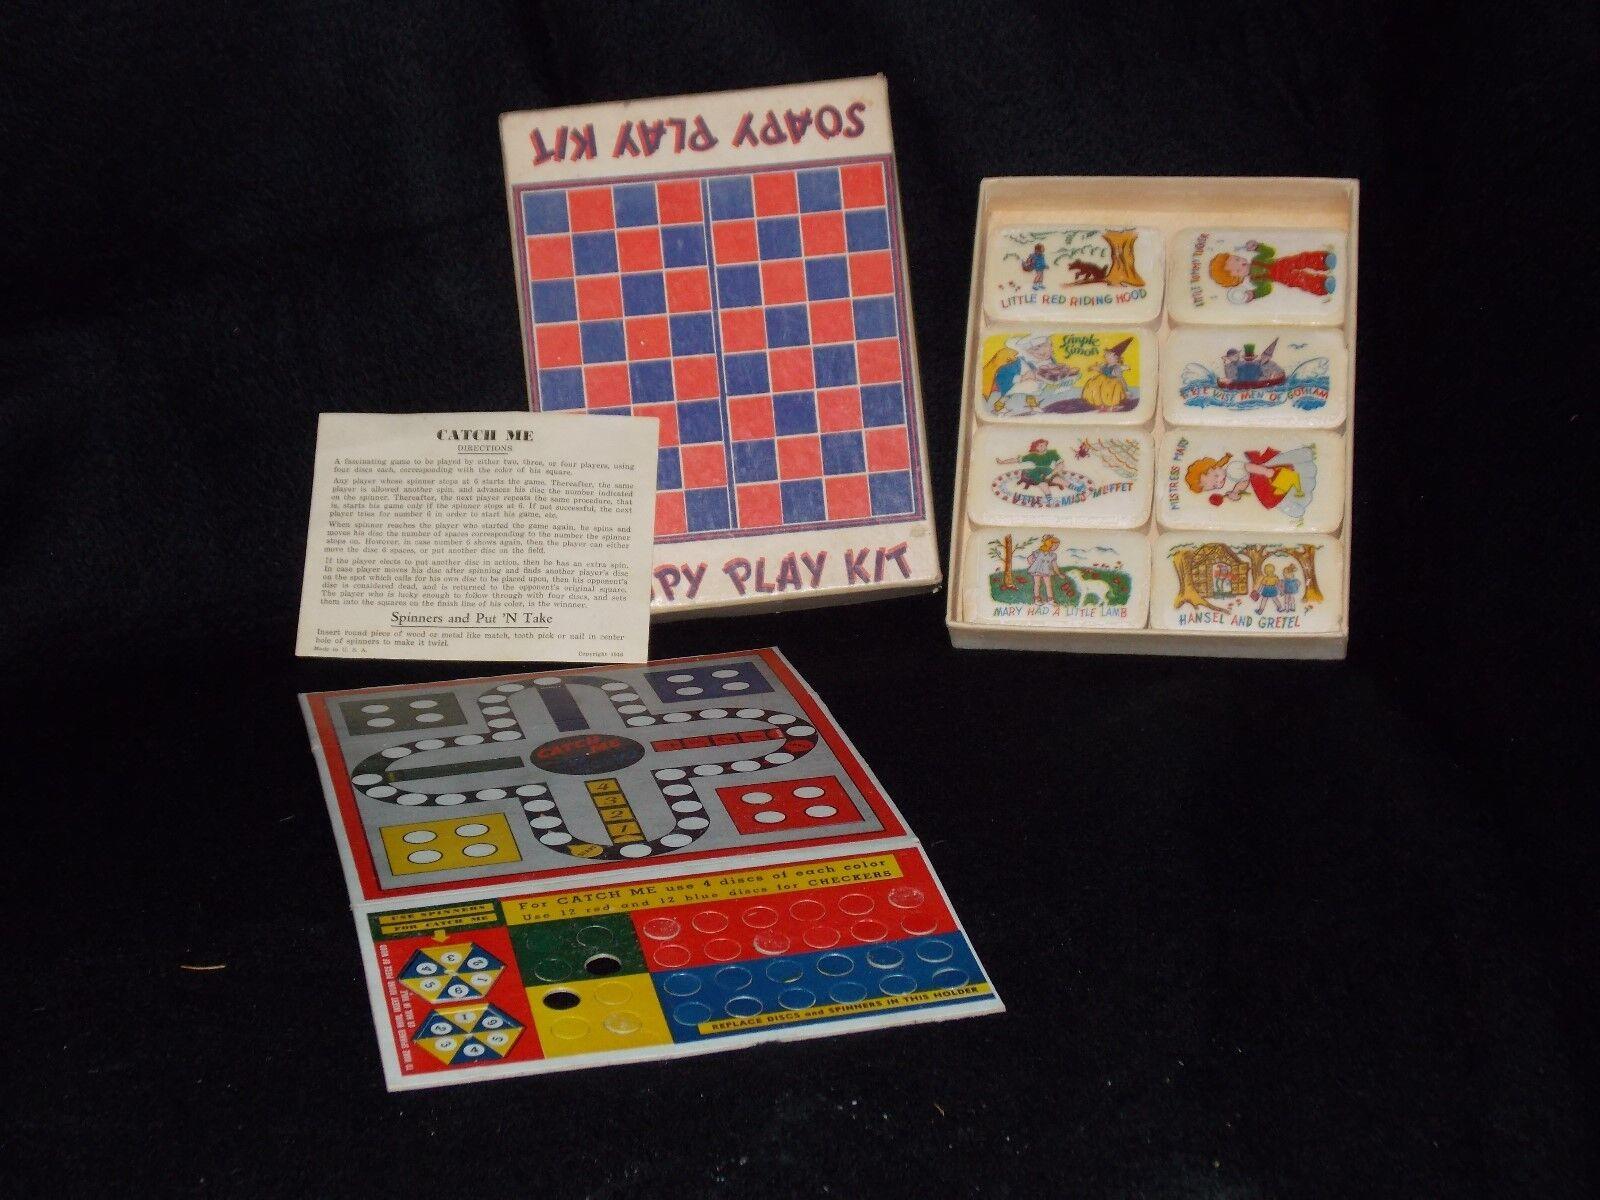 1950's Illustrated Soap Castilla Nürnsery Rhyme Soapy spela Kit spel RARE